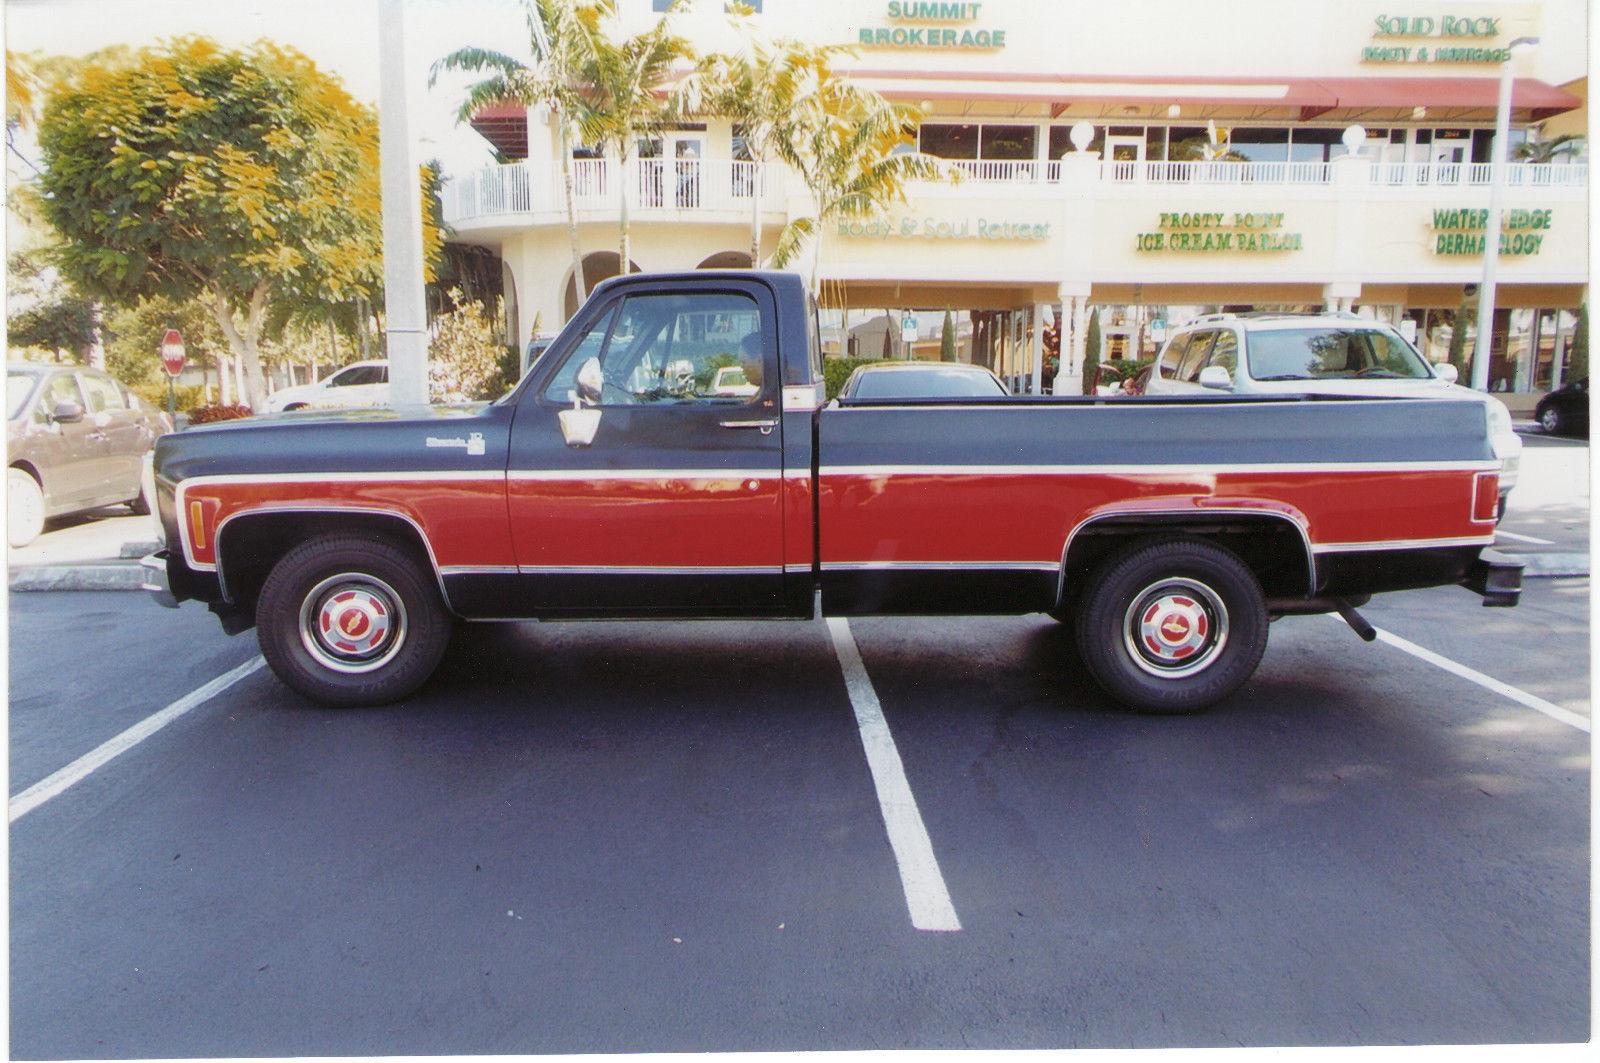 1980 chevrolet silverado c 10 long bed pick up truck classic chevrolet c 10 1980 for sale. Black Bedroom Furniture Sets. Home Design Ideas